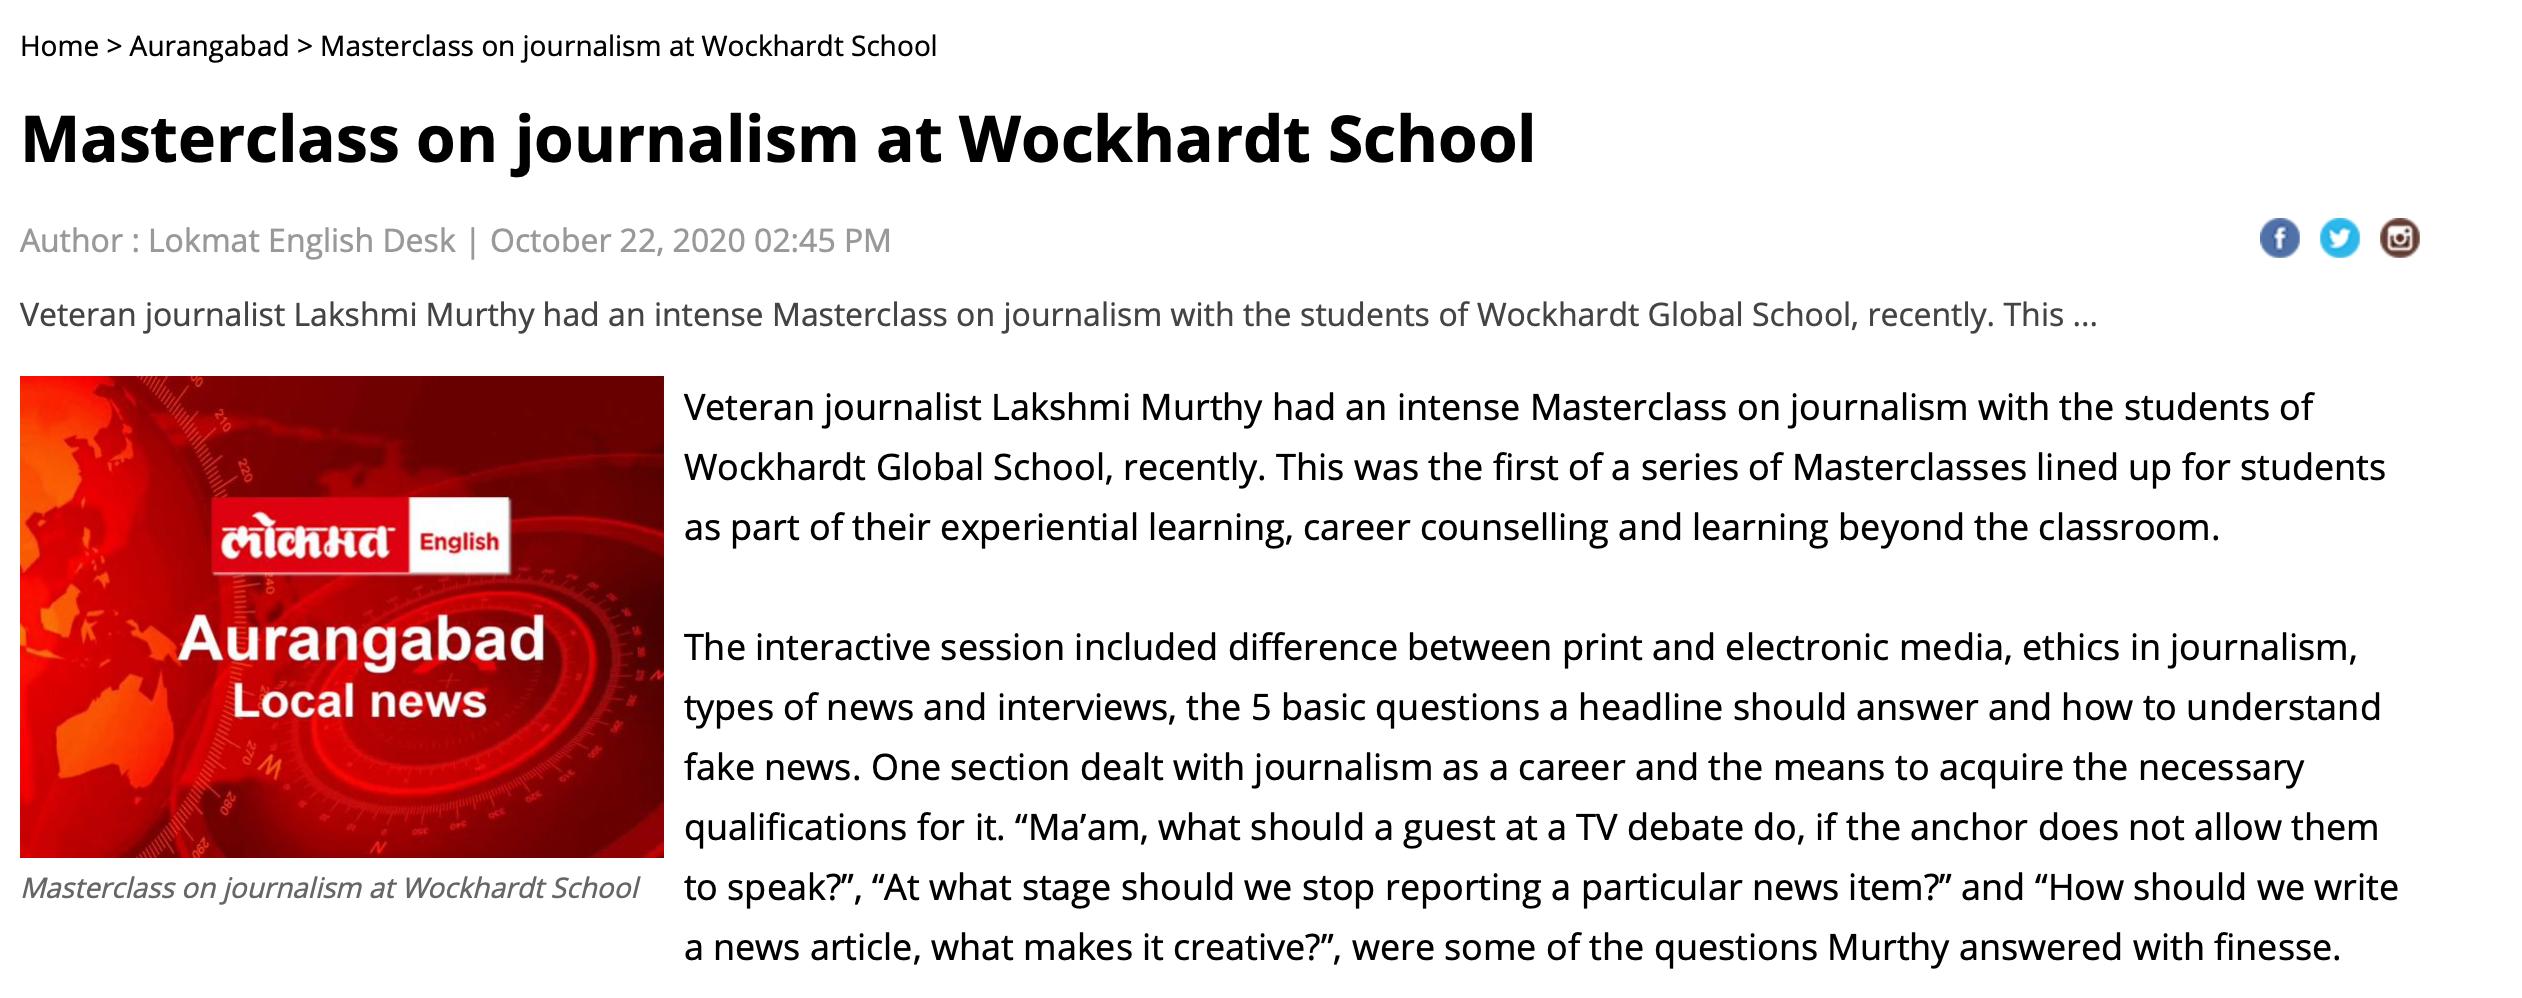 https://english.lokmat.com/aurangabad/masterclass-on-journalism-at-wockhardt-school/